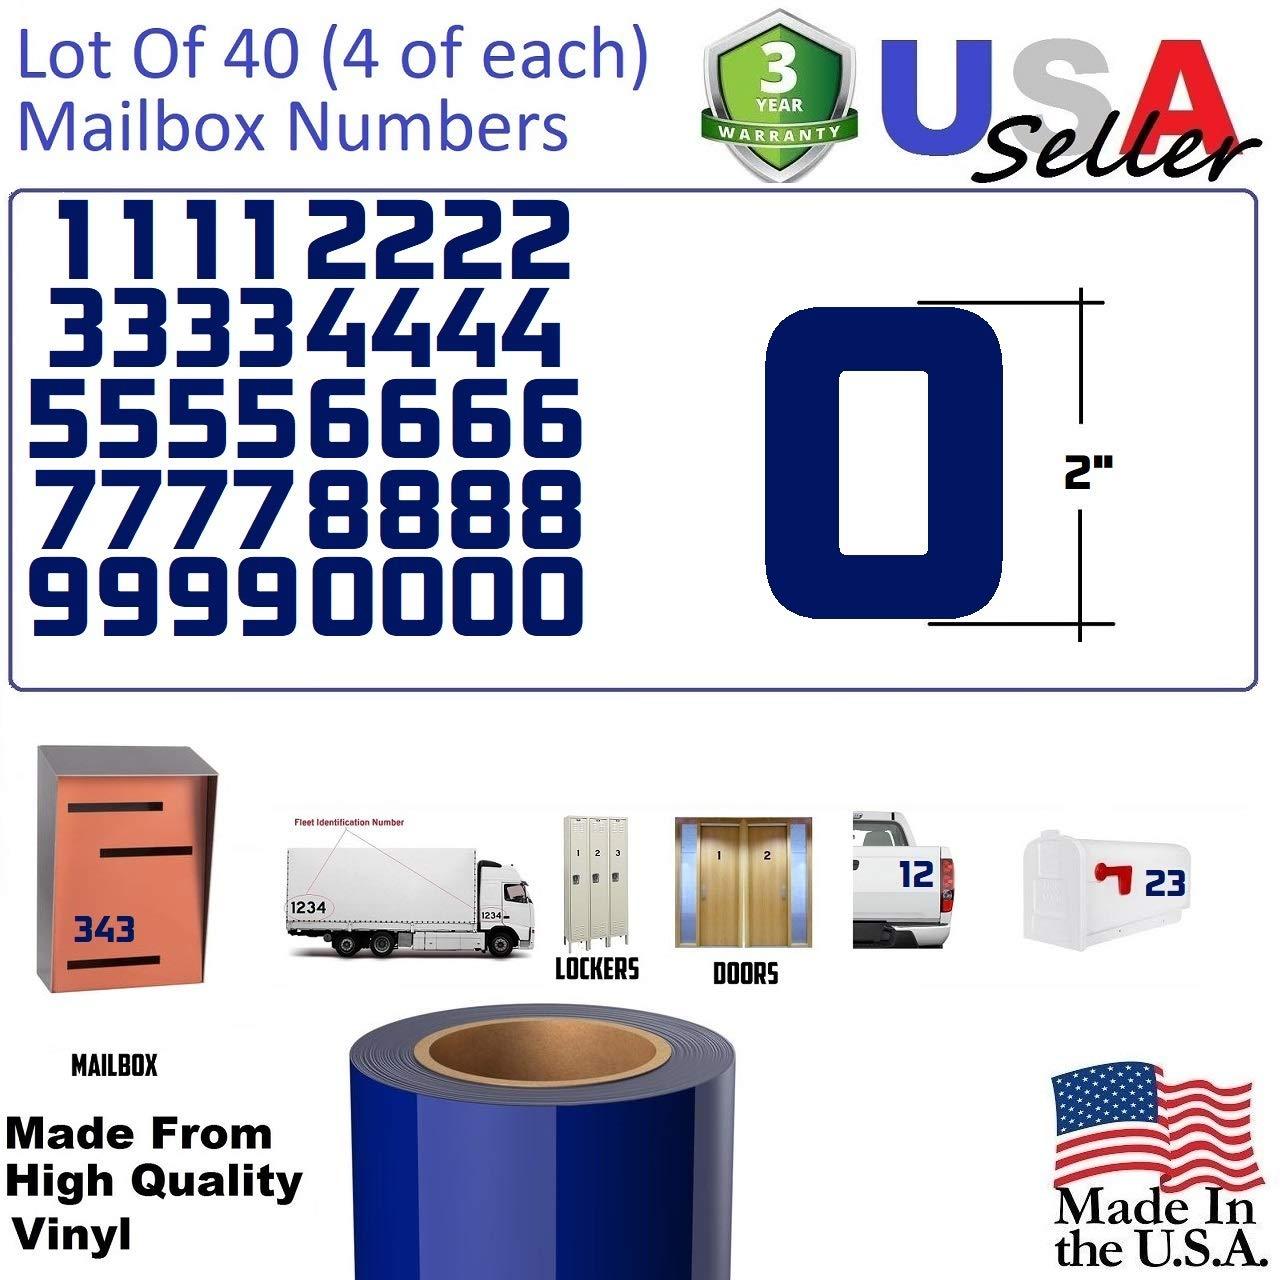 2'' Blue Color Custom Mailbox Numbers - Lot of 40(4 of each number form 0 to 9) 2 inch tall, Blue Modern Vinyl Mailbox Numbers,Doors,Tool Box,Locker,Car,Truck,Address Decal Stickers (Konkretika Bold)